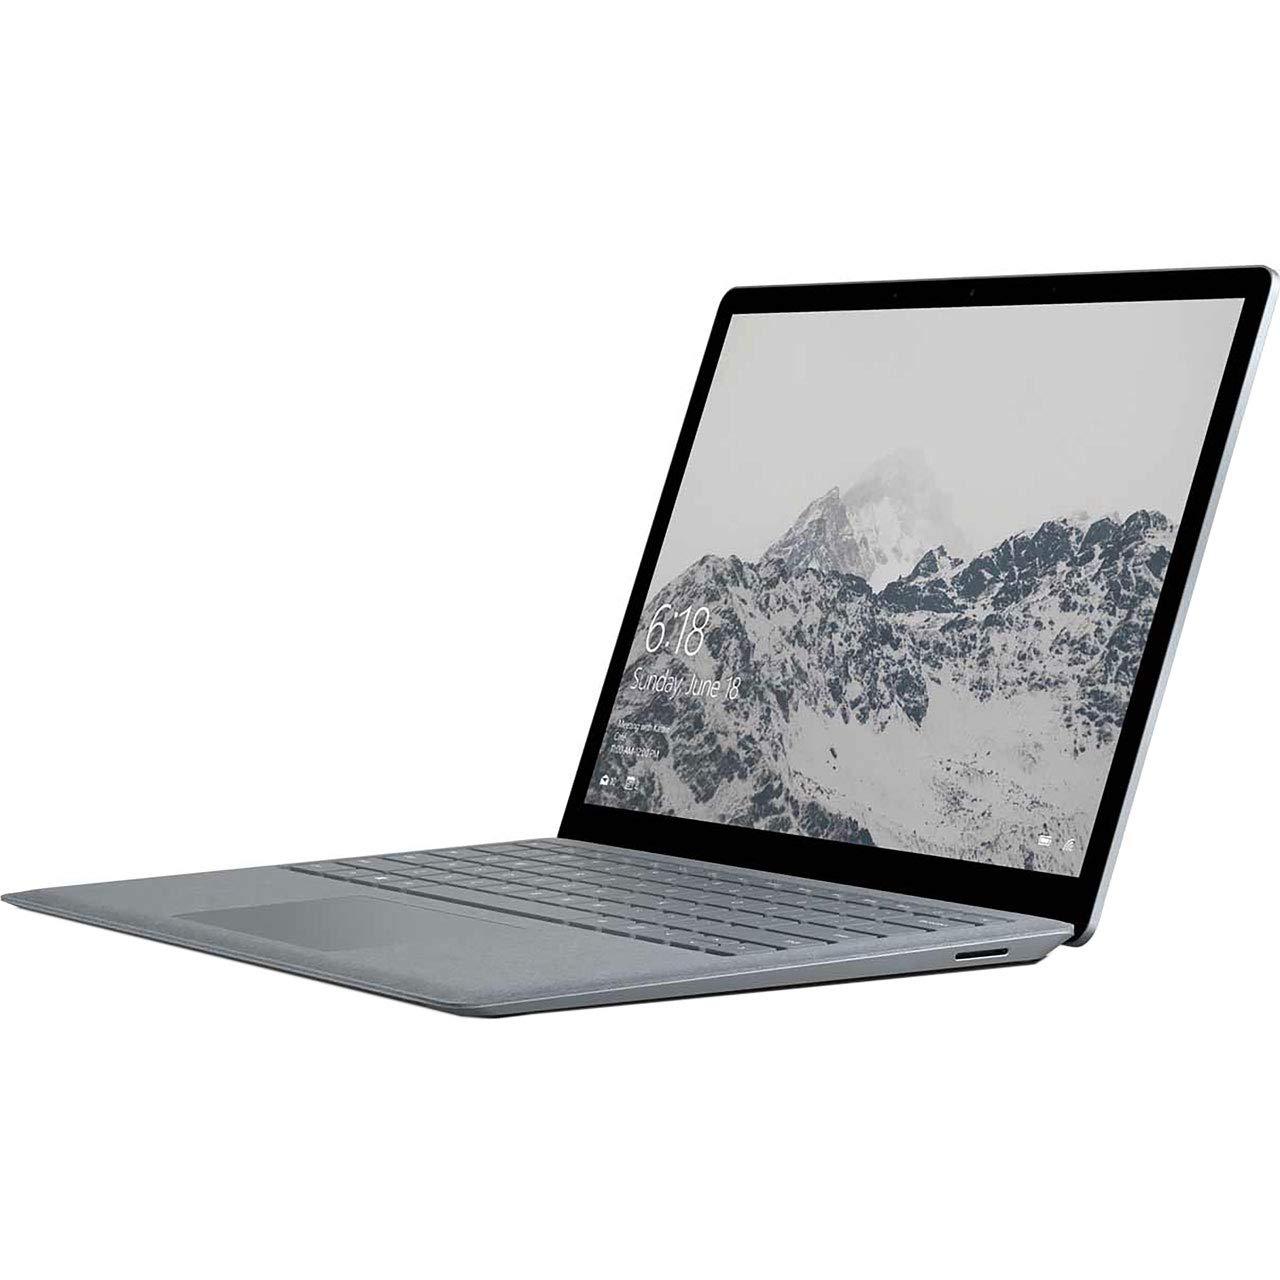 Microsoft 13.5-inch Touchscreen Surface Laptop - (Platinum) (Intel M-5Y70 Processor, 4 GB RAM, 128 GB SSD, Intel HD 5300) @ £499.99 @ Amazon